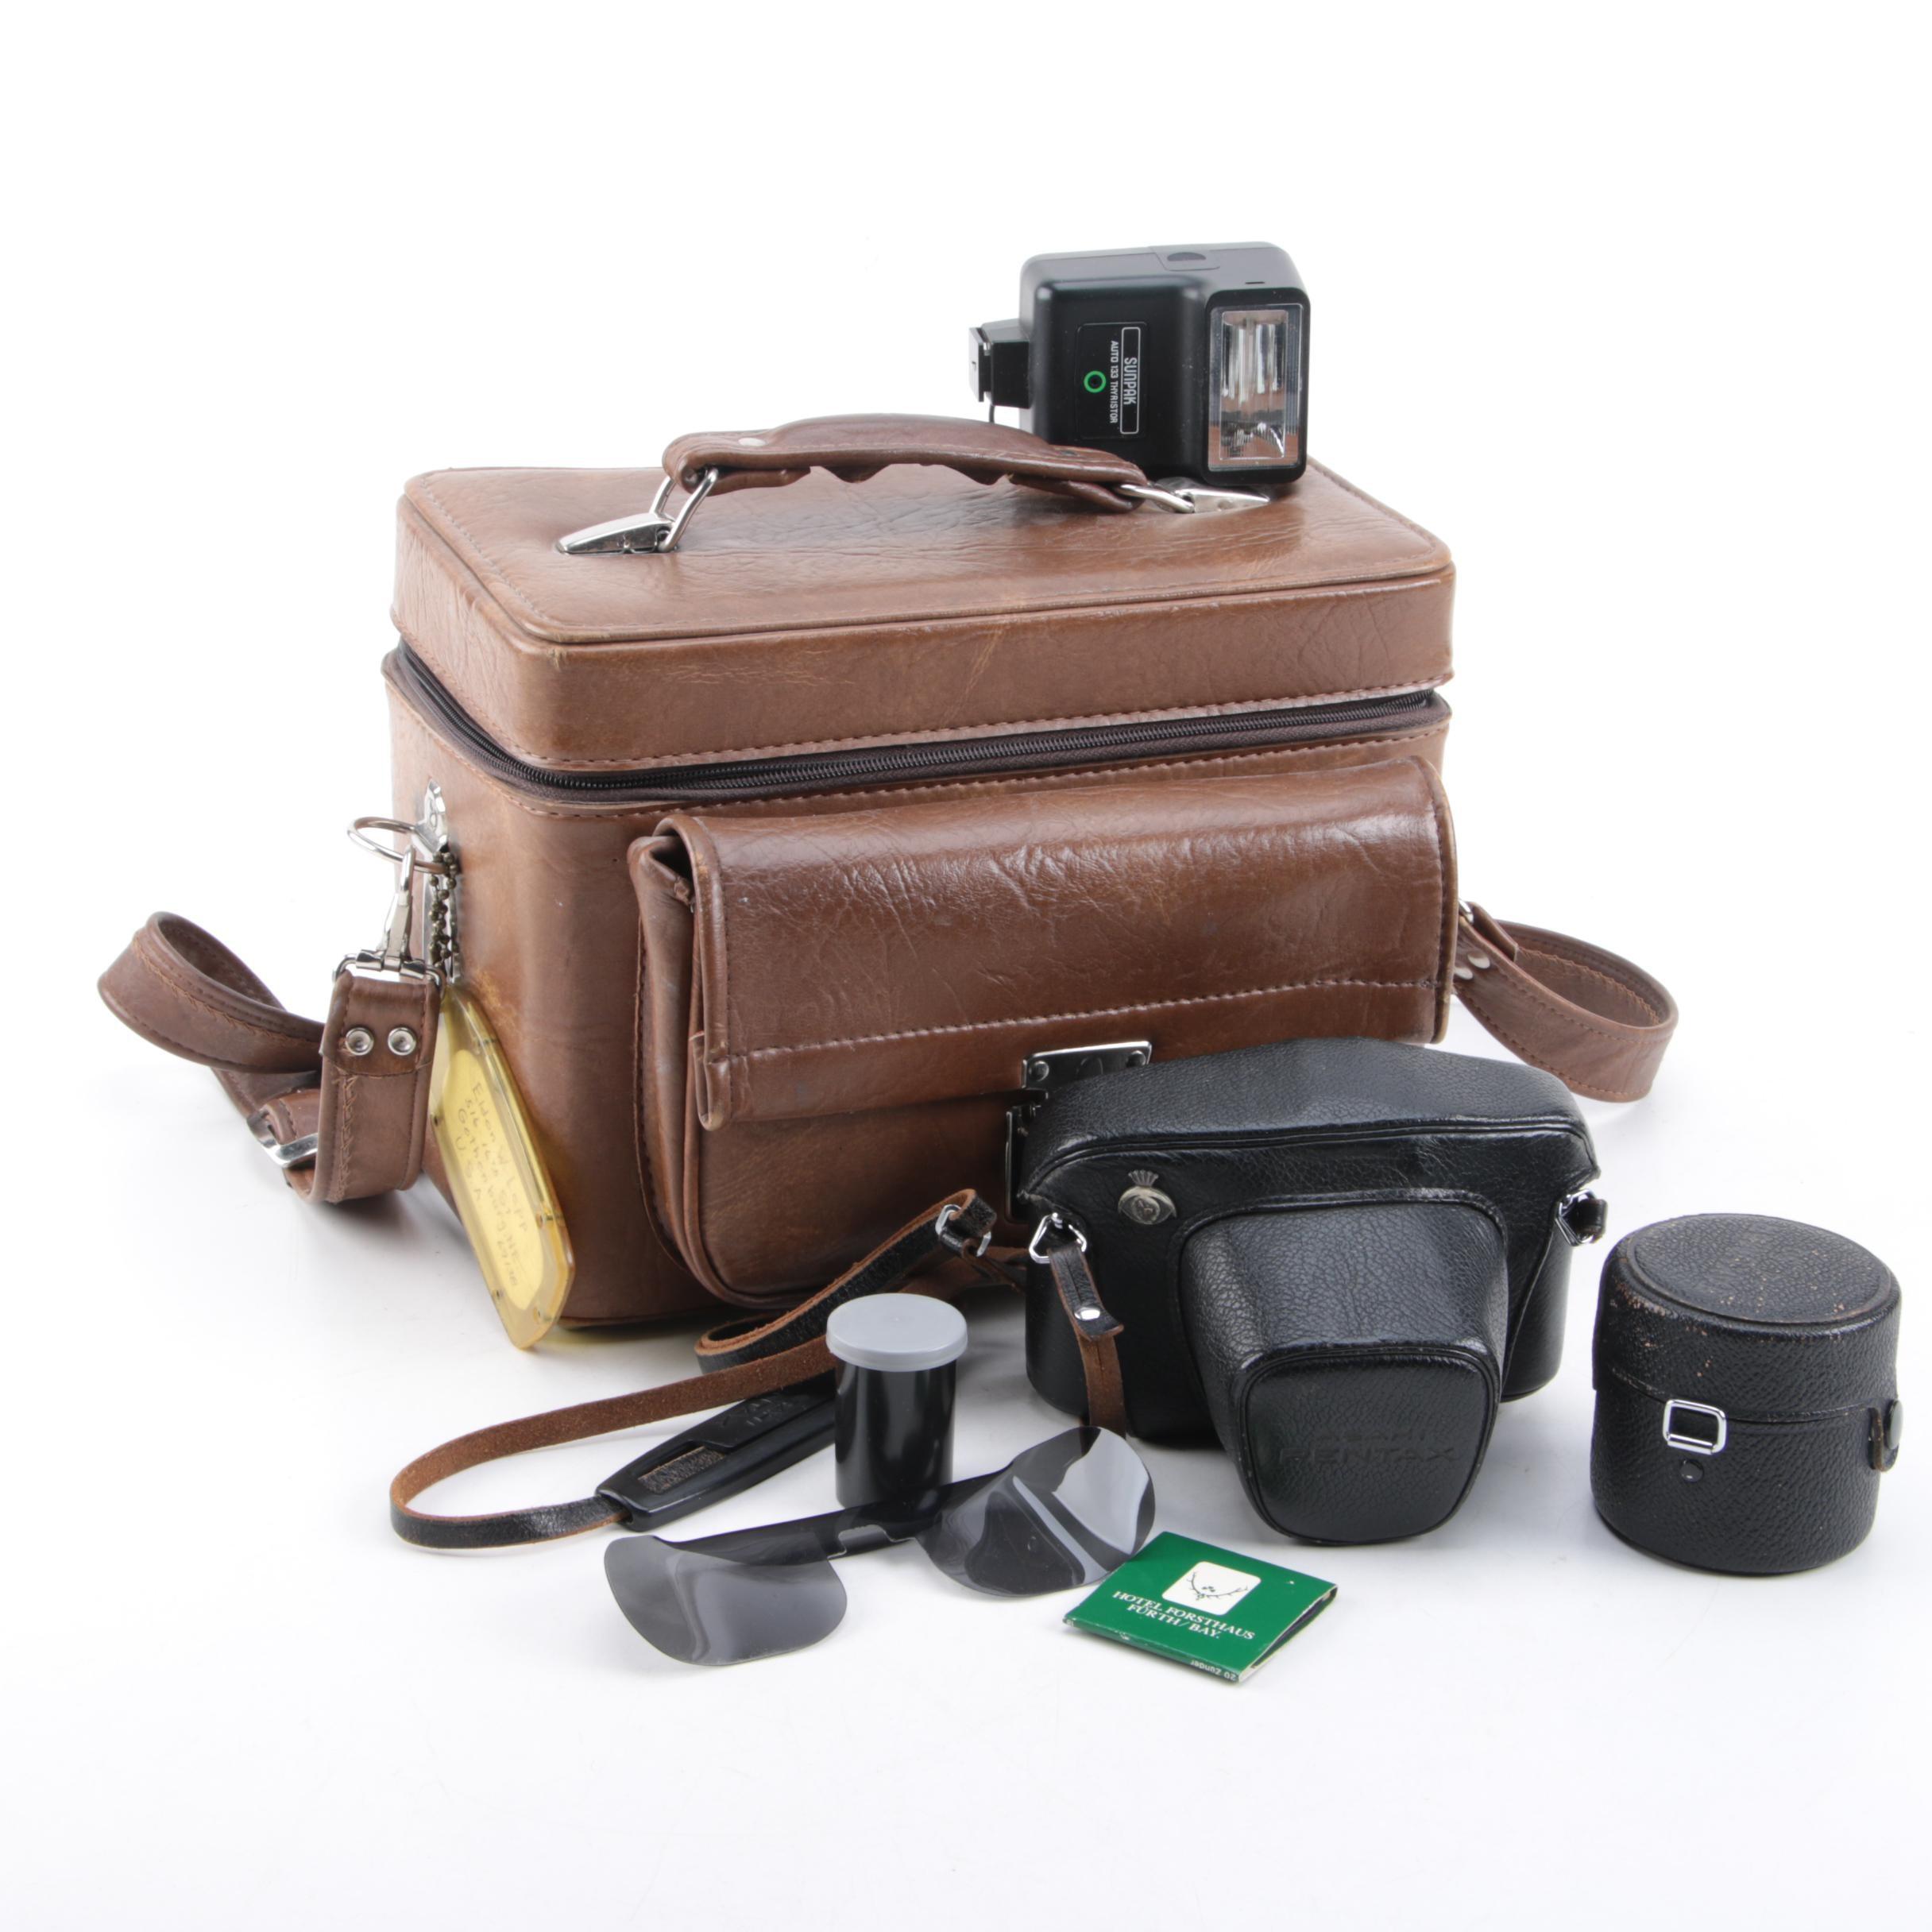 Asahi Pentax Sportmatic SLR Still Camera and Accessories in Case